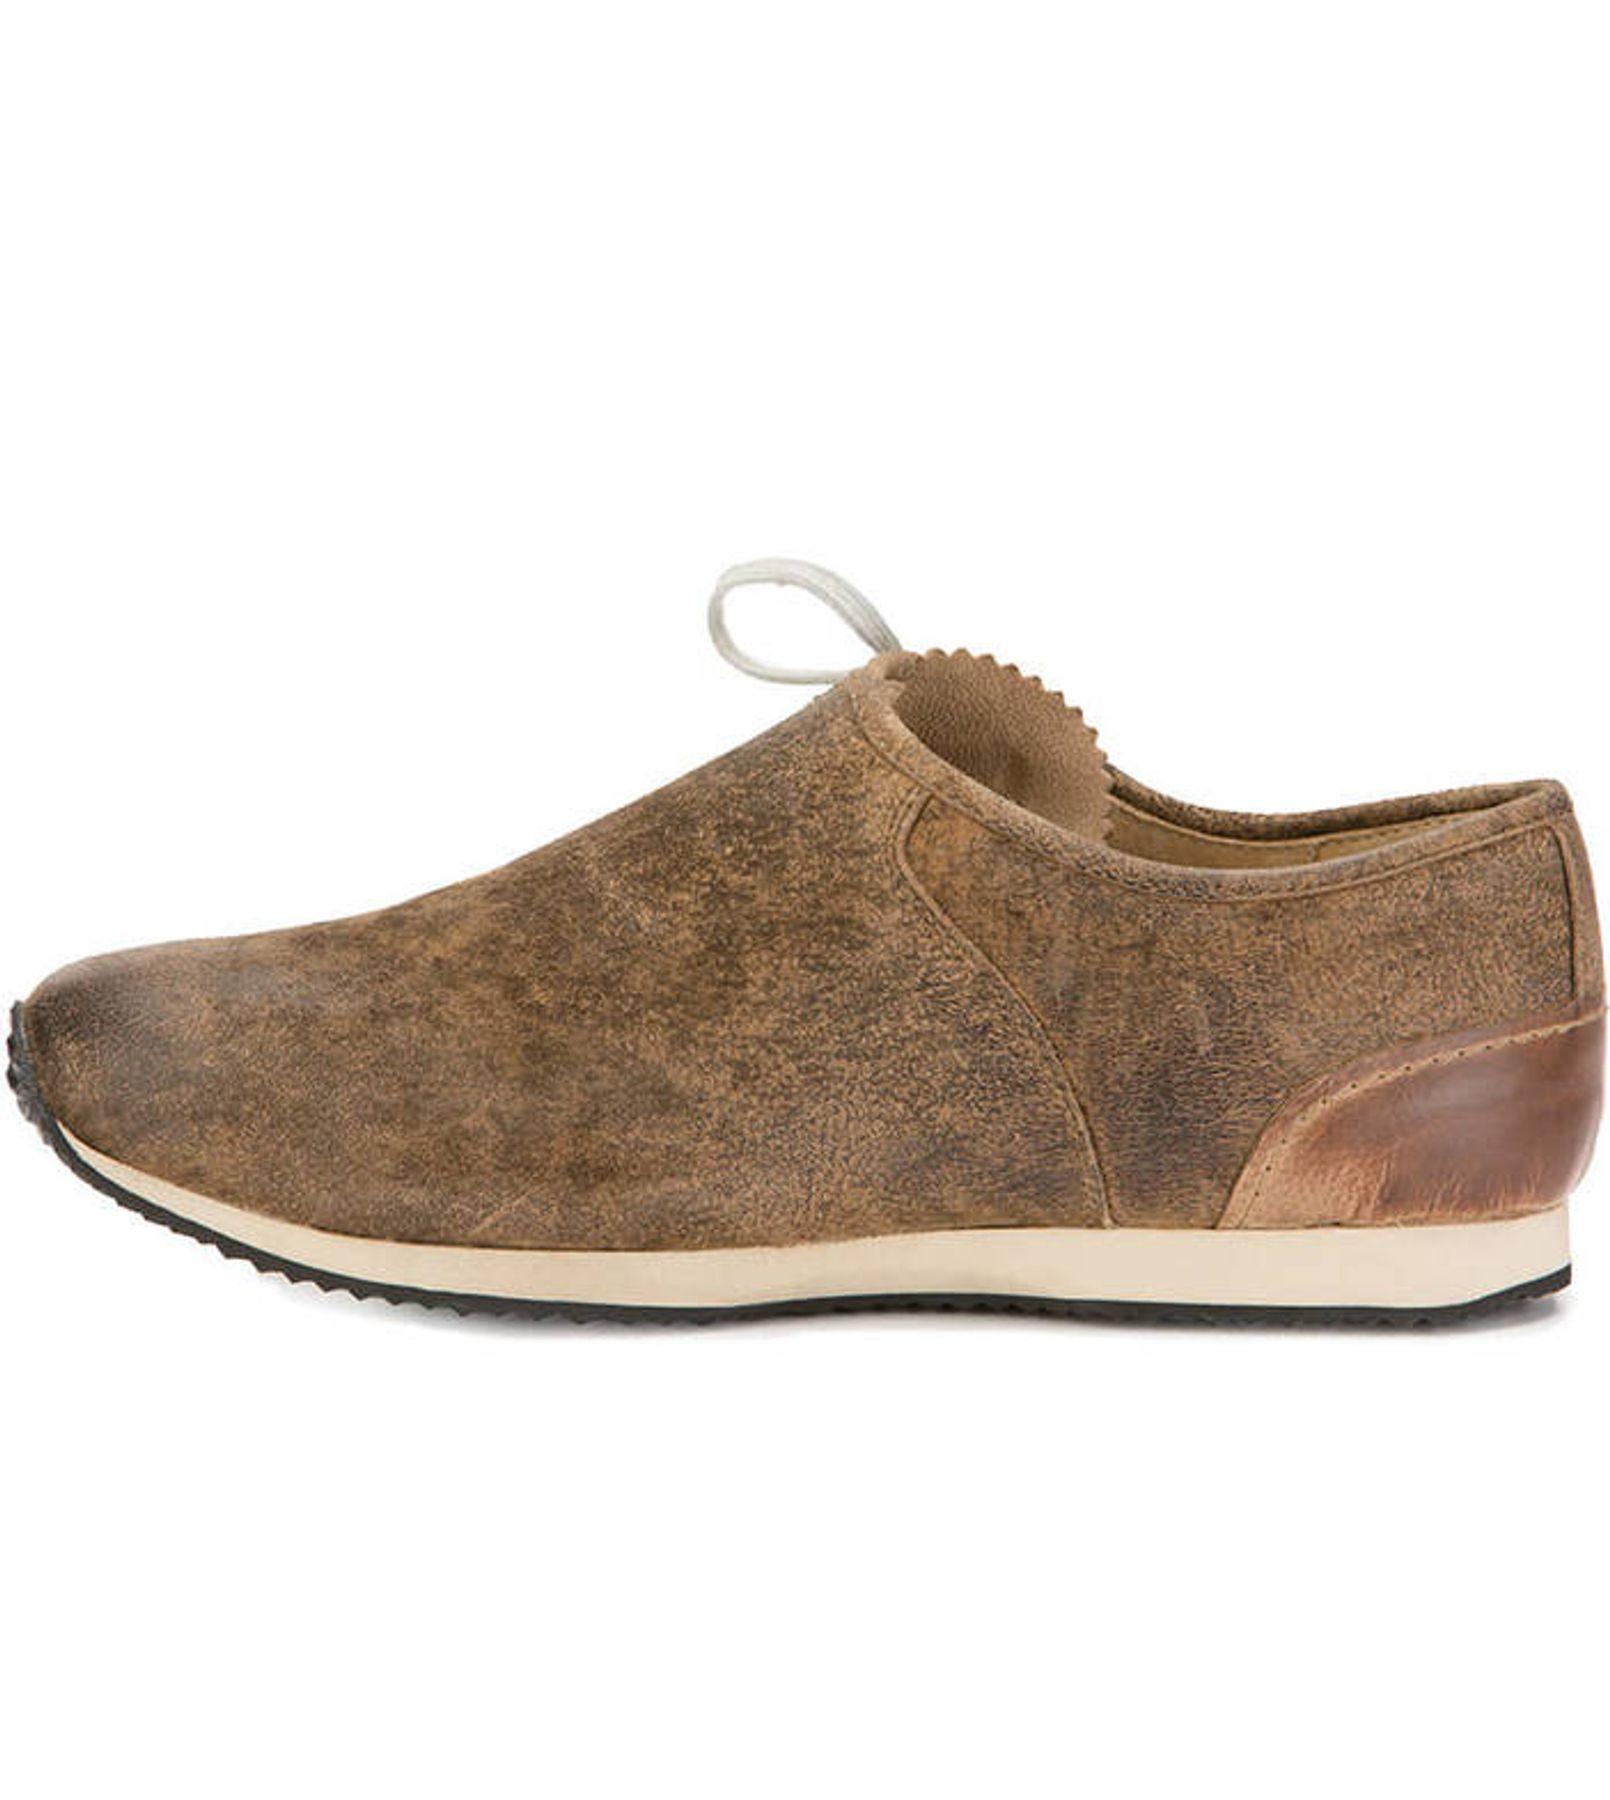 Stockerpoint- Herren Trachten Schuhe in Havanna, 1340 – Bild 3